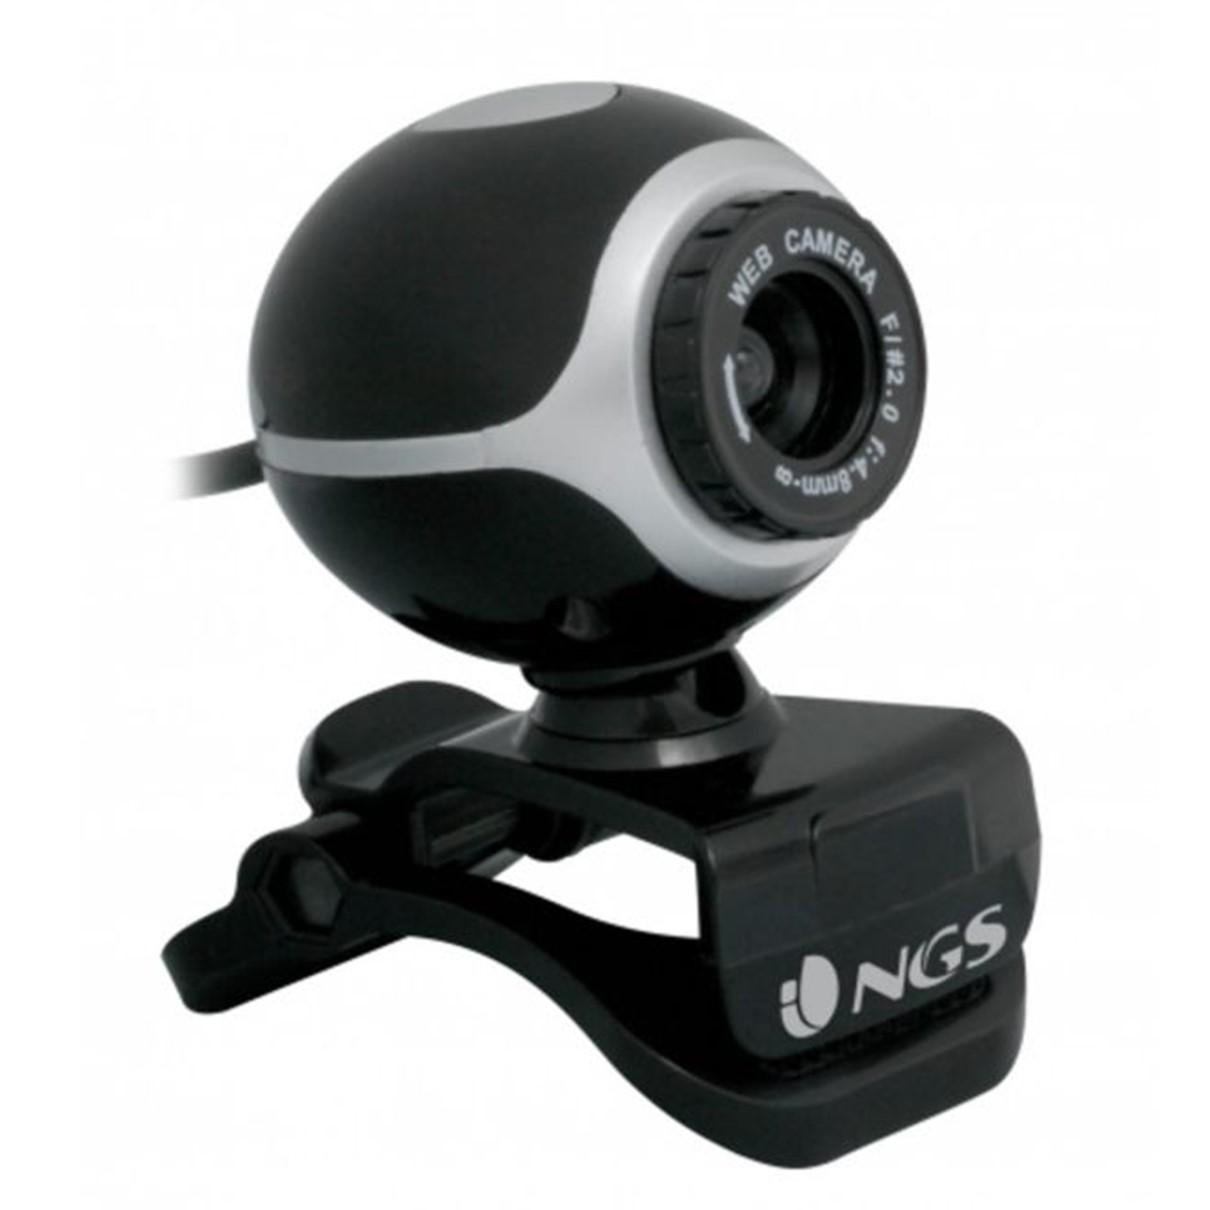 WEBCAM NGS XPRESS CAM 300 MICROFONO INCORPORADO 5MPX NEGRO